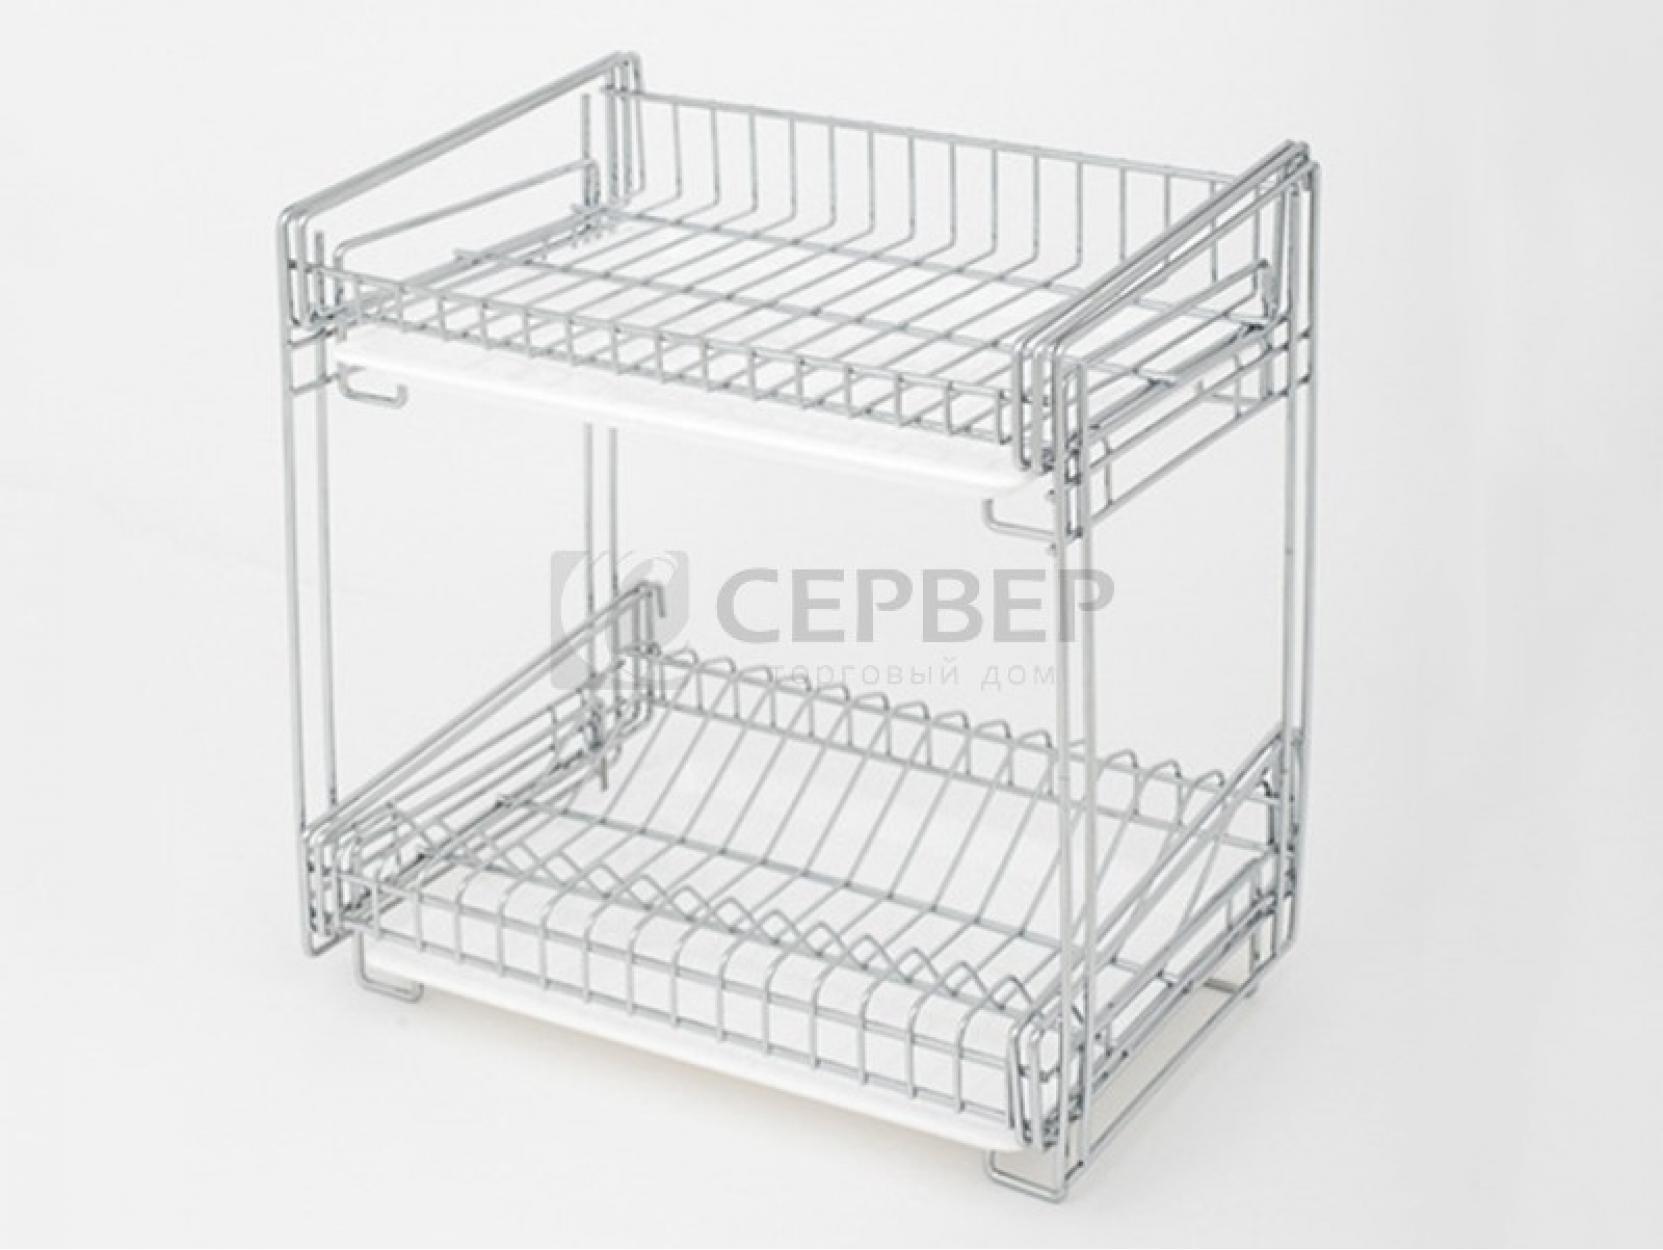 Полка двухъярусная для стаканов и тарелок настольная 340x235x350мм, хром, CWJ268C